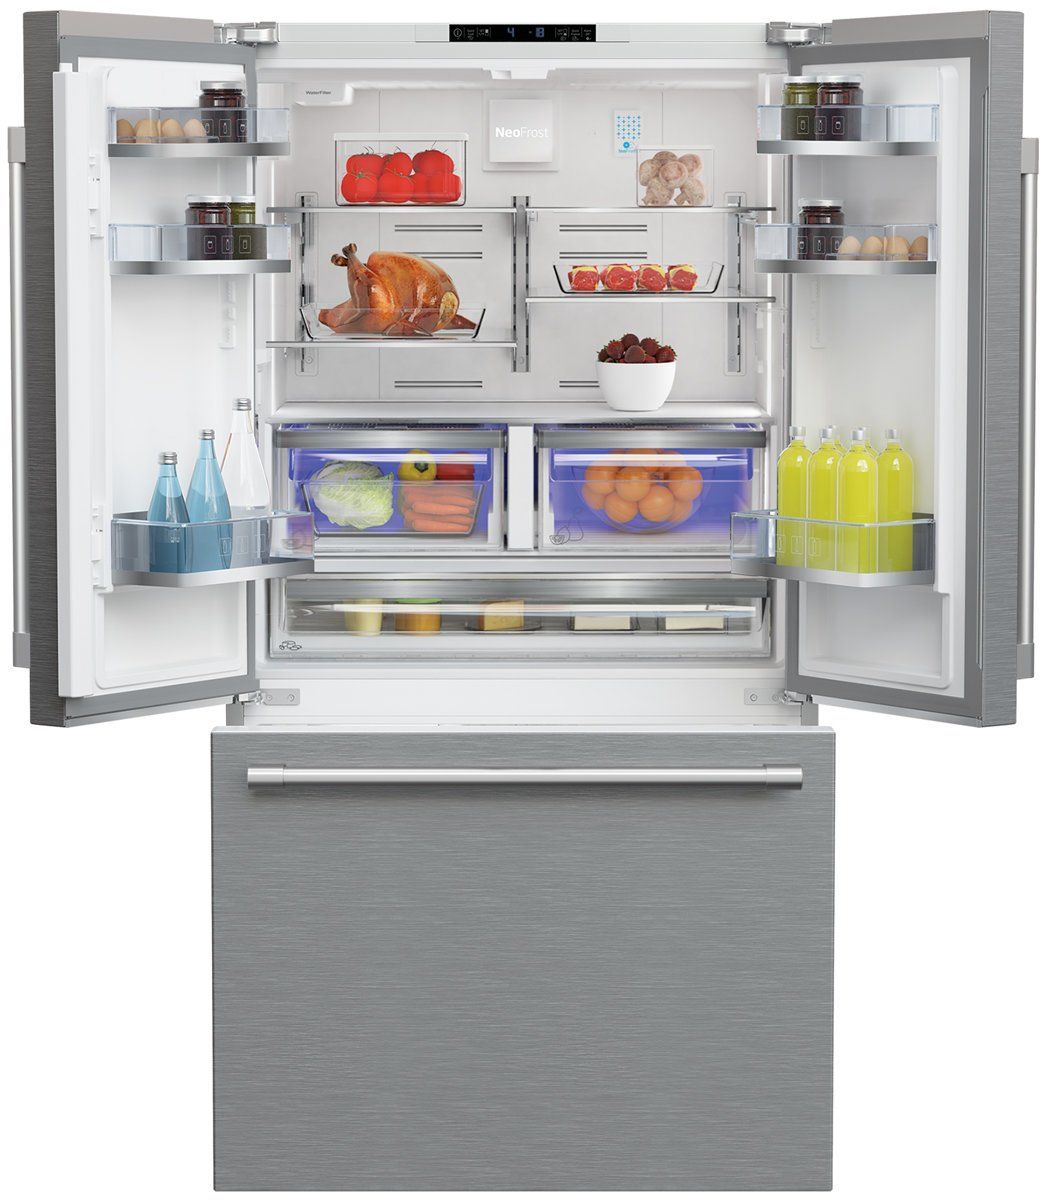 kitchenaid french door refrigerator manual